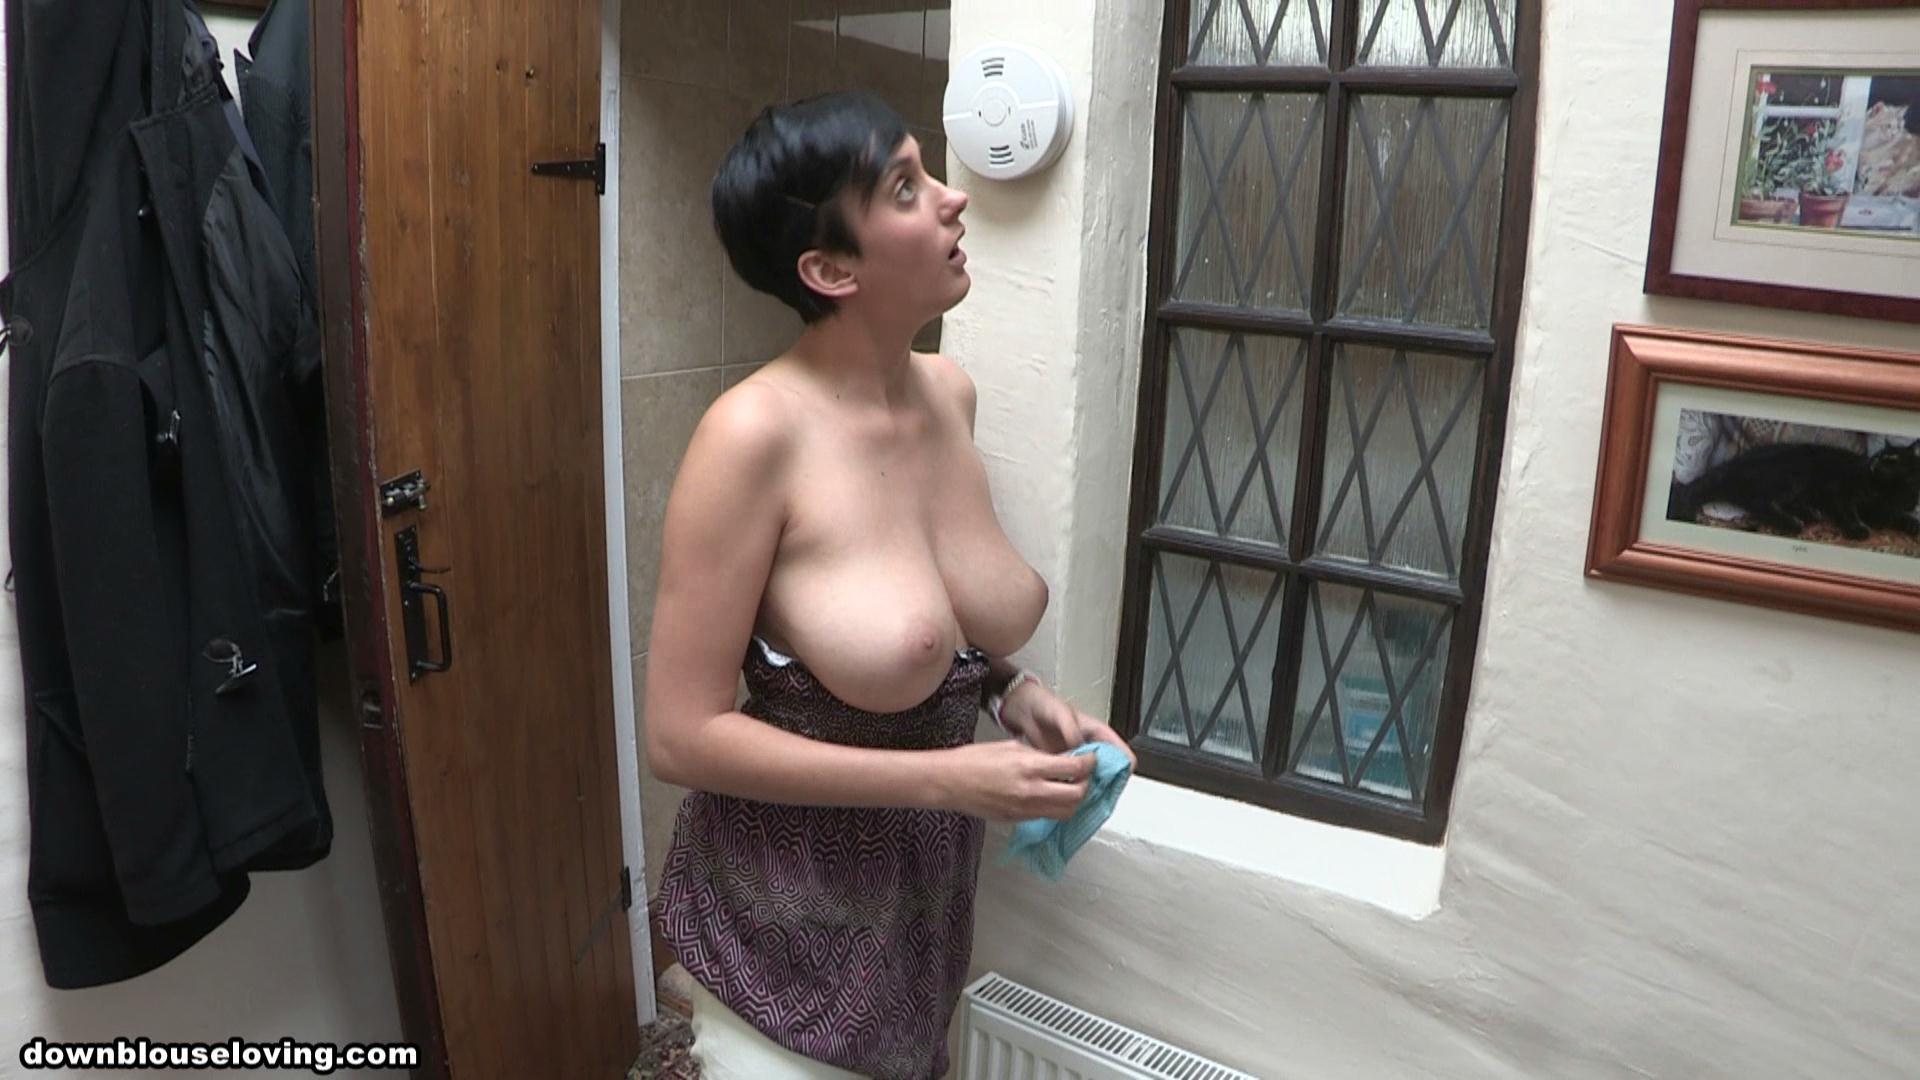 accidental downblouse nipple nip slips